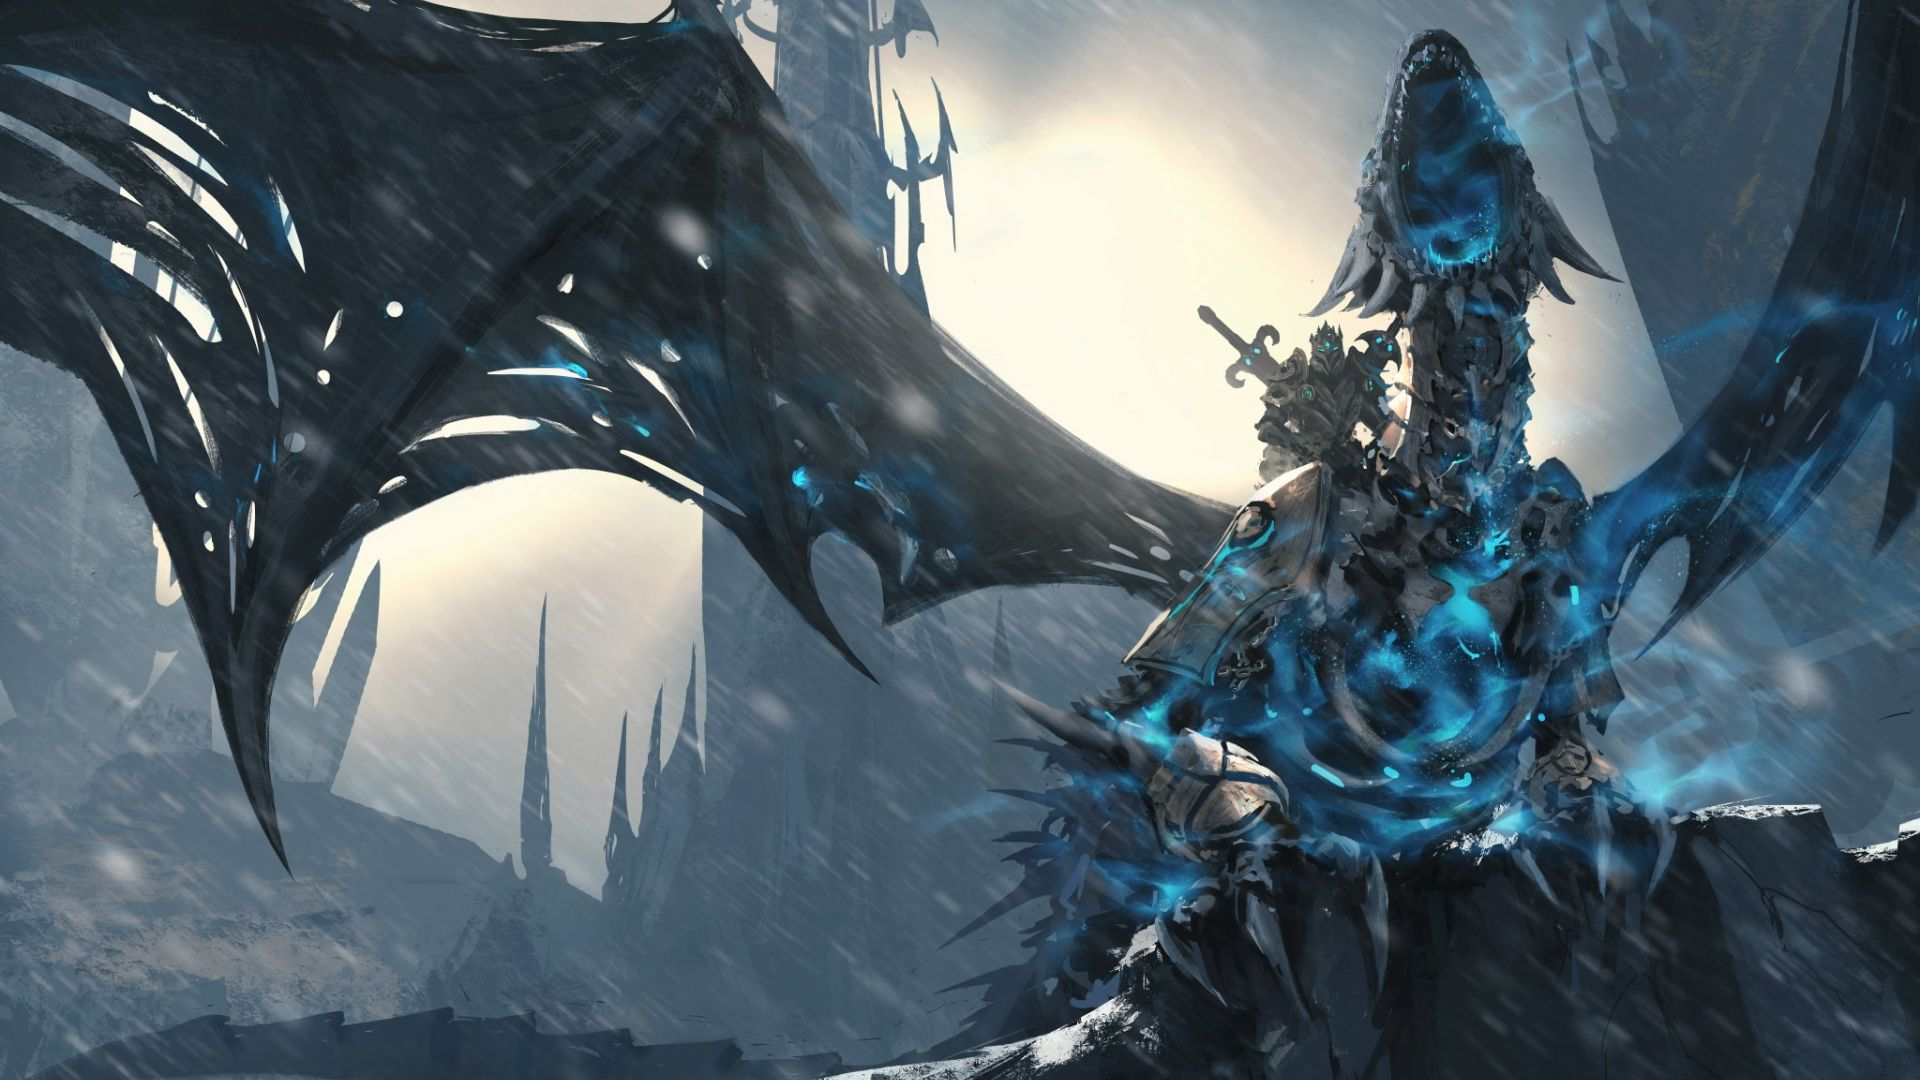 Downaload Overlord King And Warriors Art Wallpaper: Desktop Wallpaper World Of Warcraft: Wrath Of The Lich